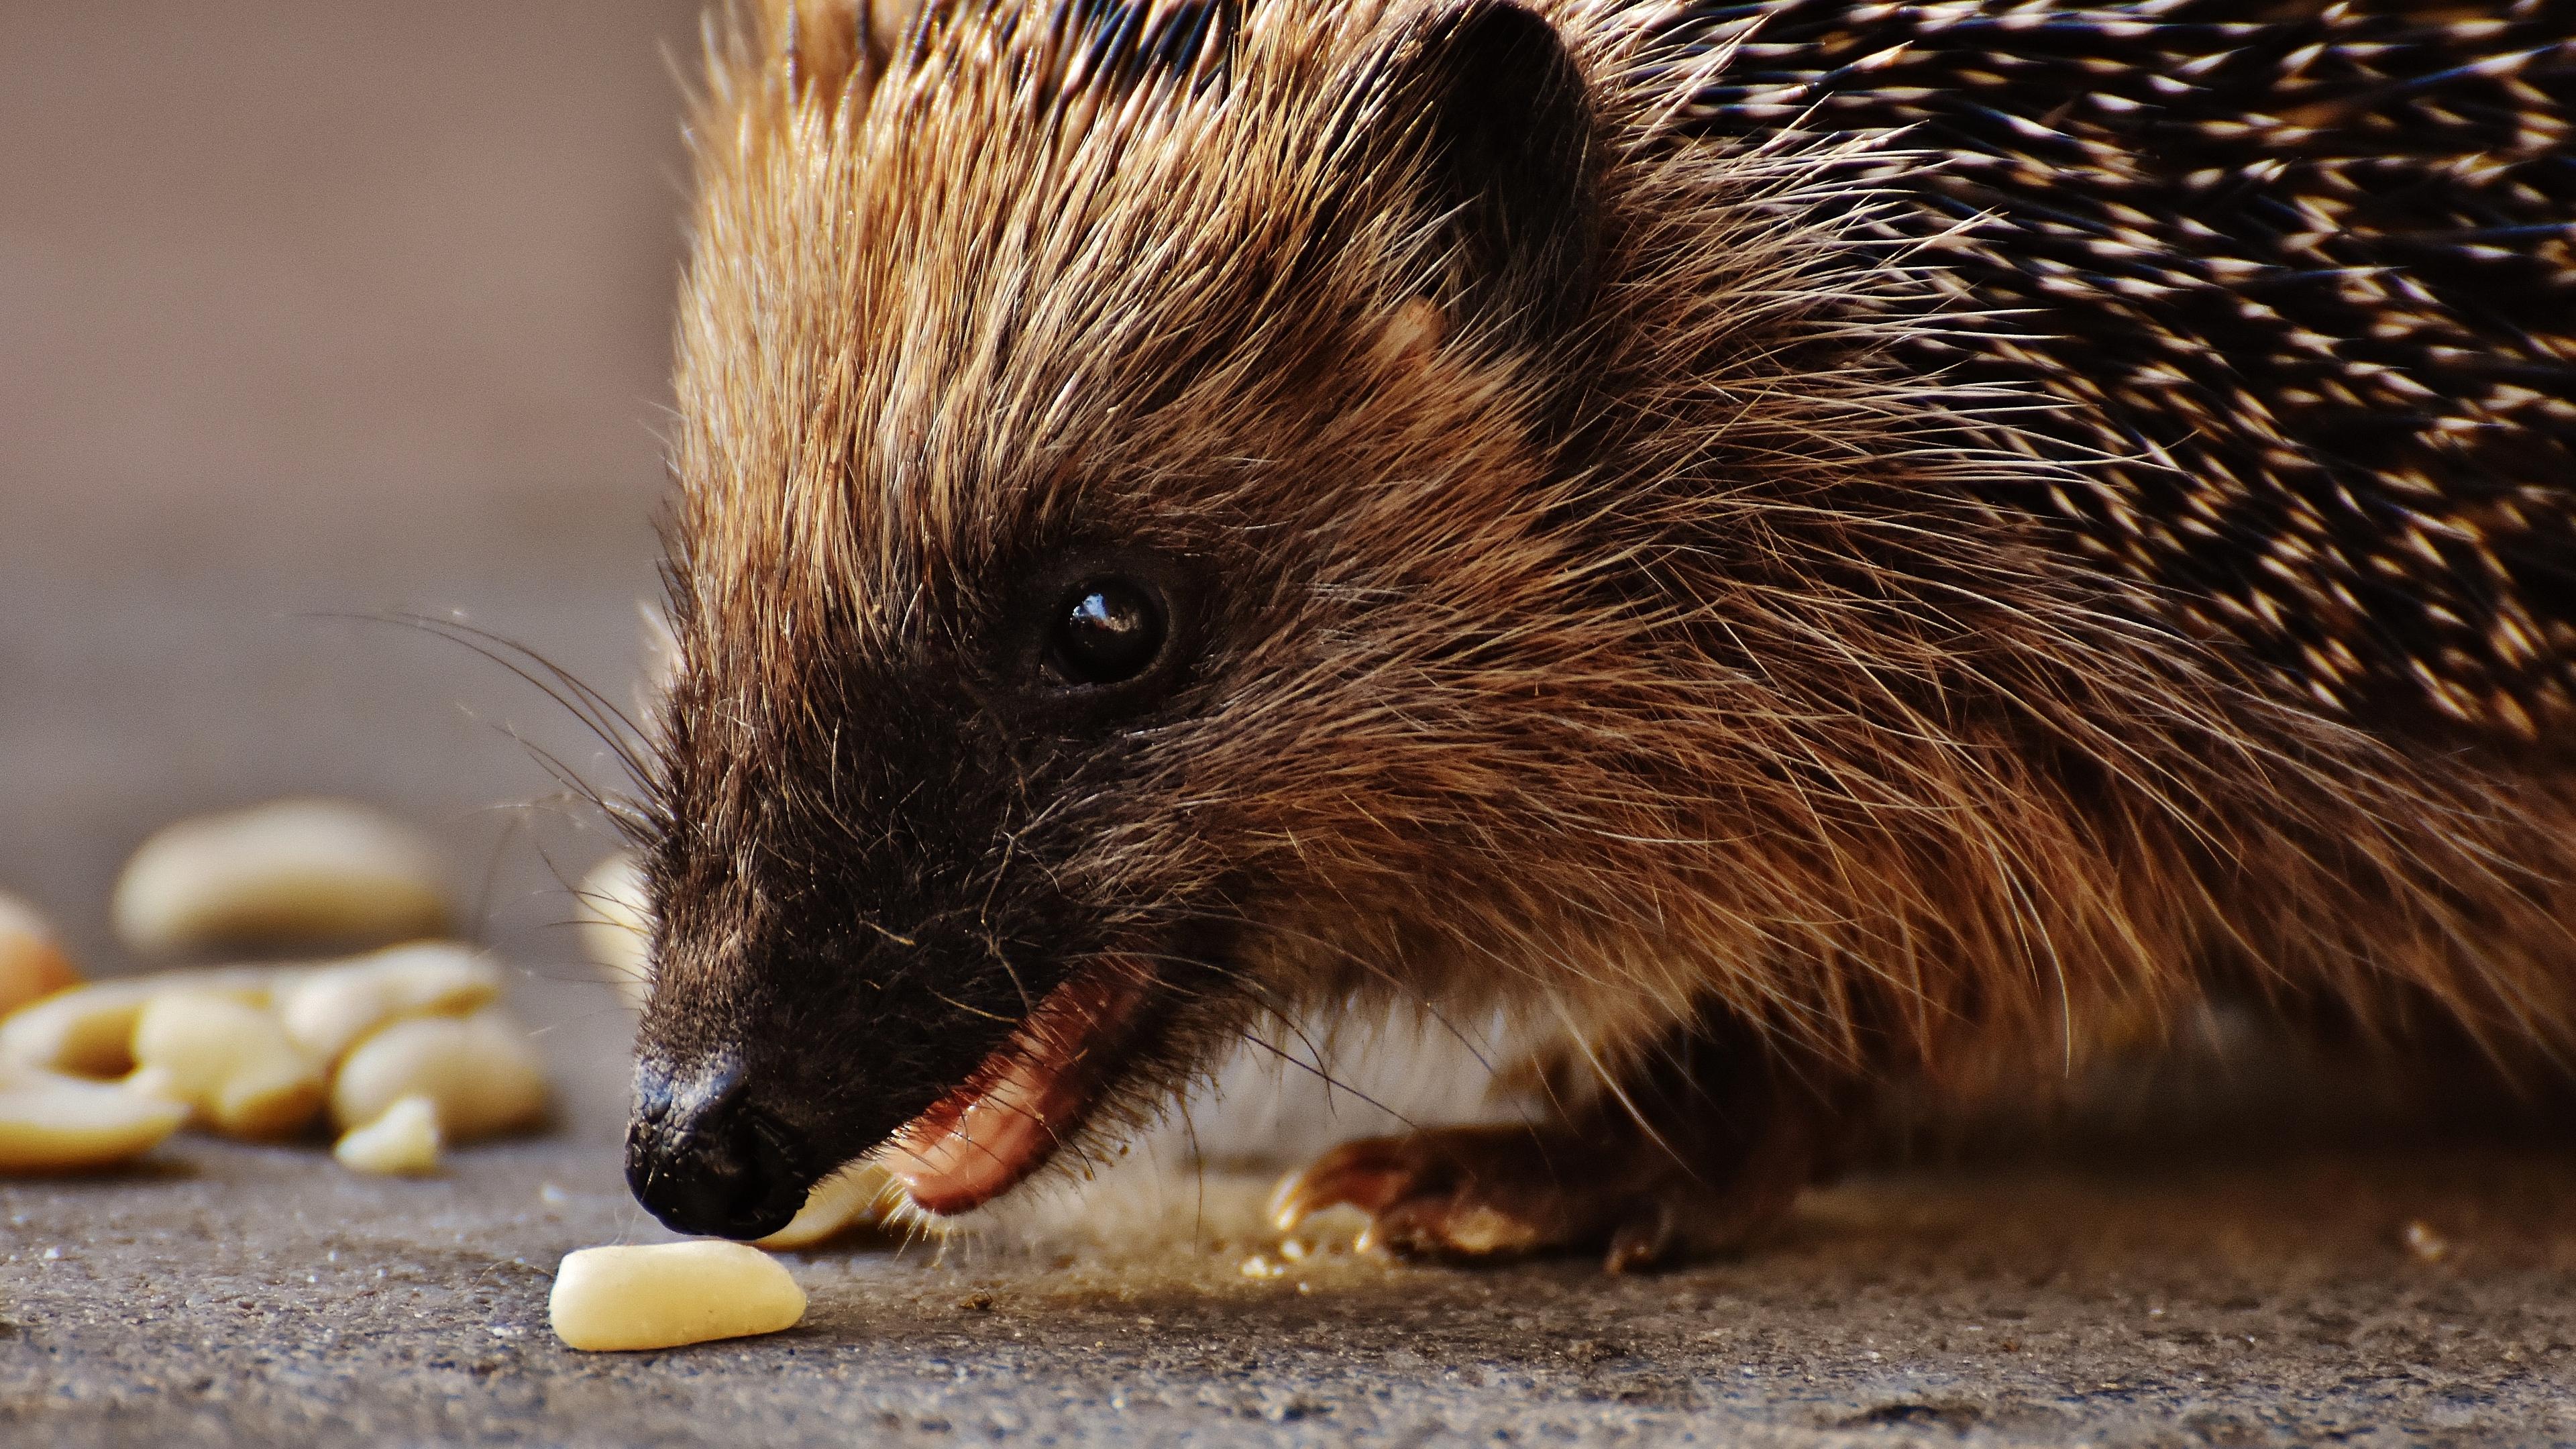 hedgehog prickles meal muzzle 4k 1542241873 - hedgehog, prickles, meal, muzzle 4k - prickles, meal, hedgehog